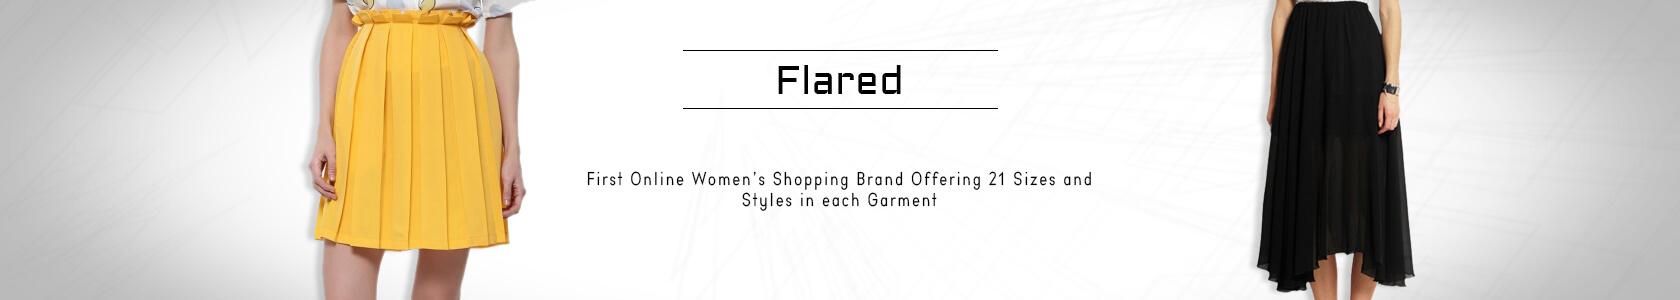 Flared